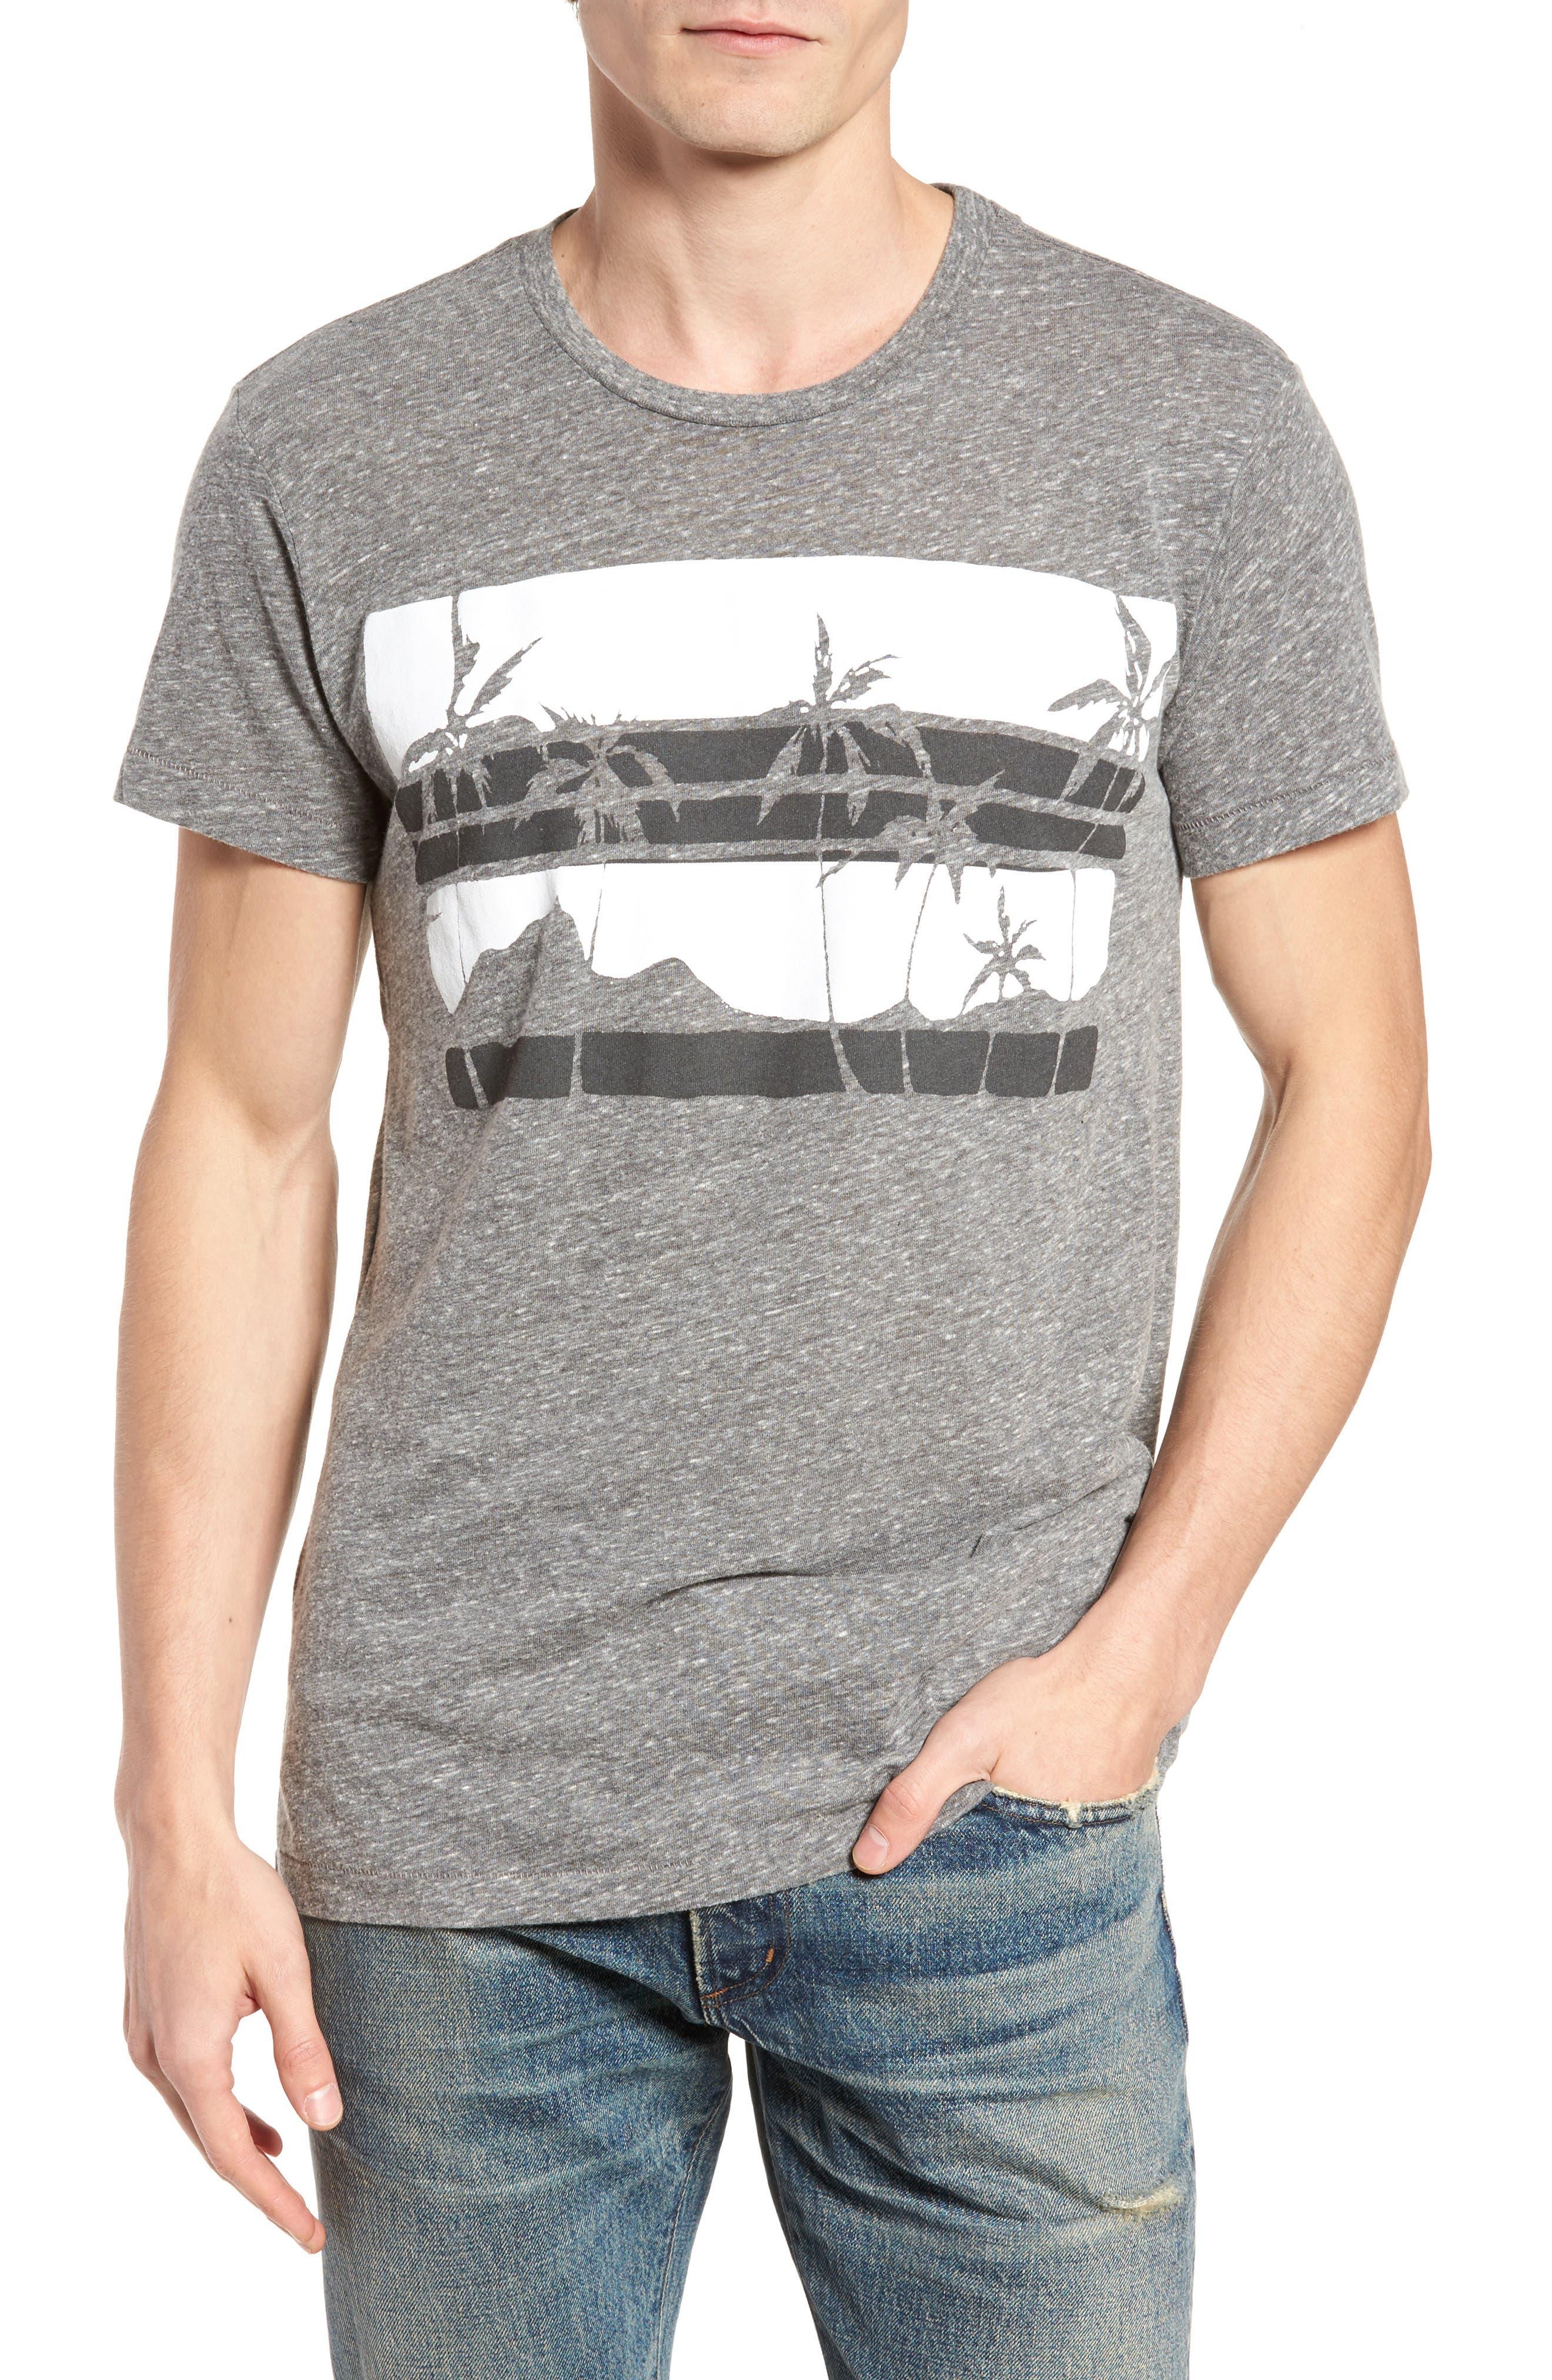 Las Palmas T-Shirt,                             Main thumbnail 1, color,                             060